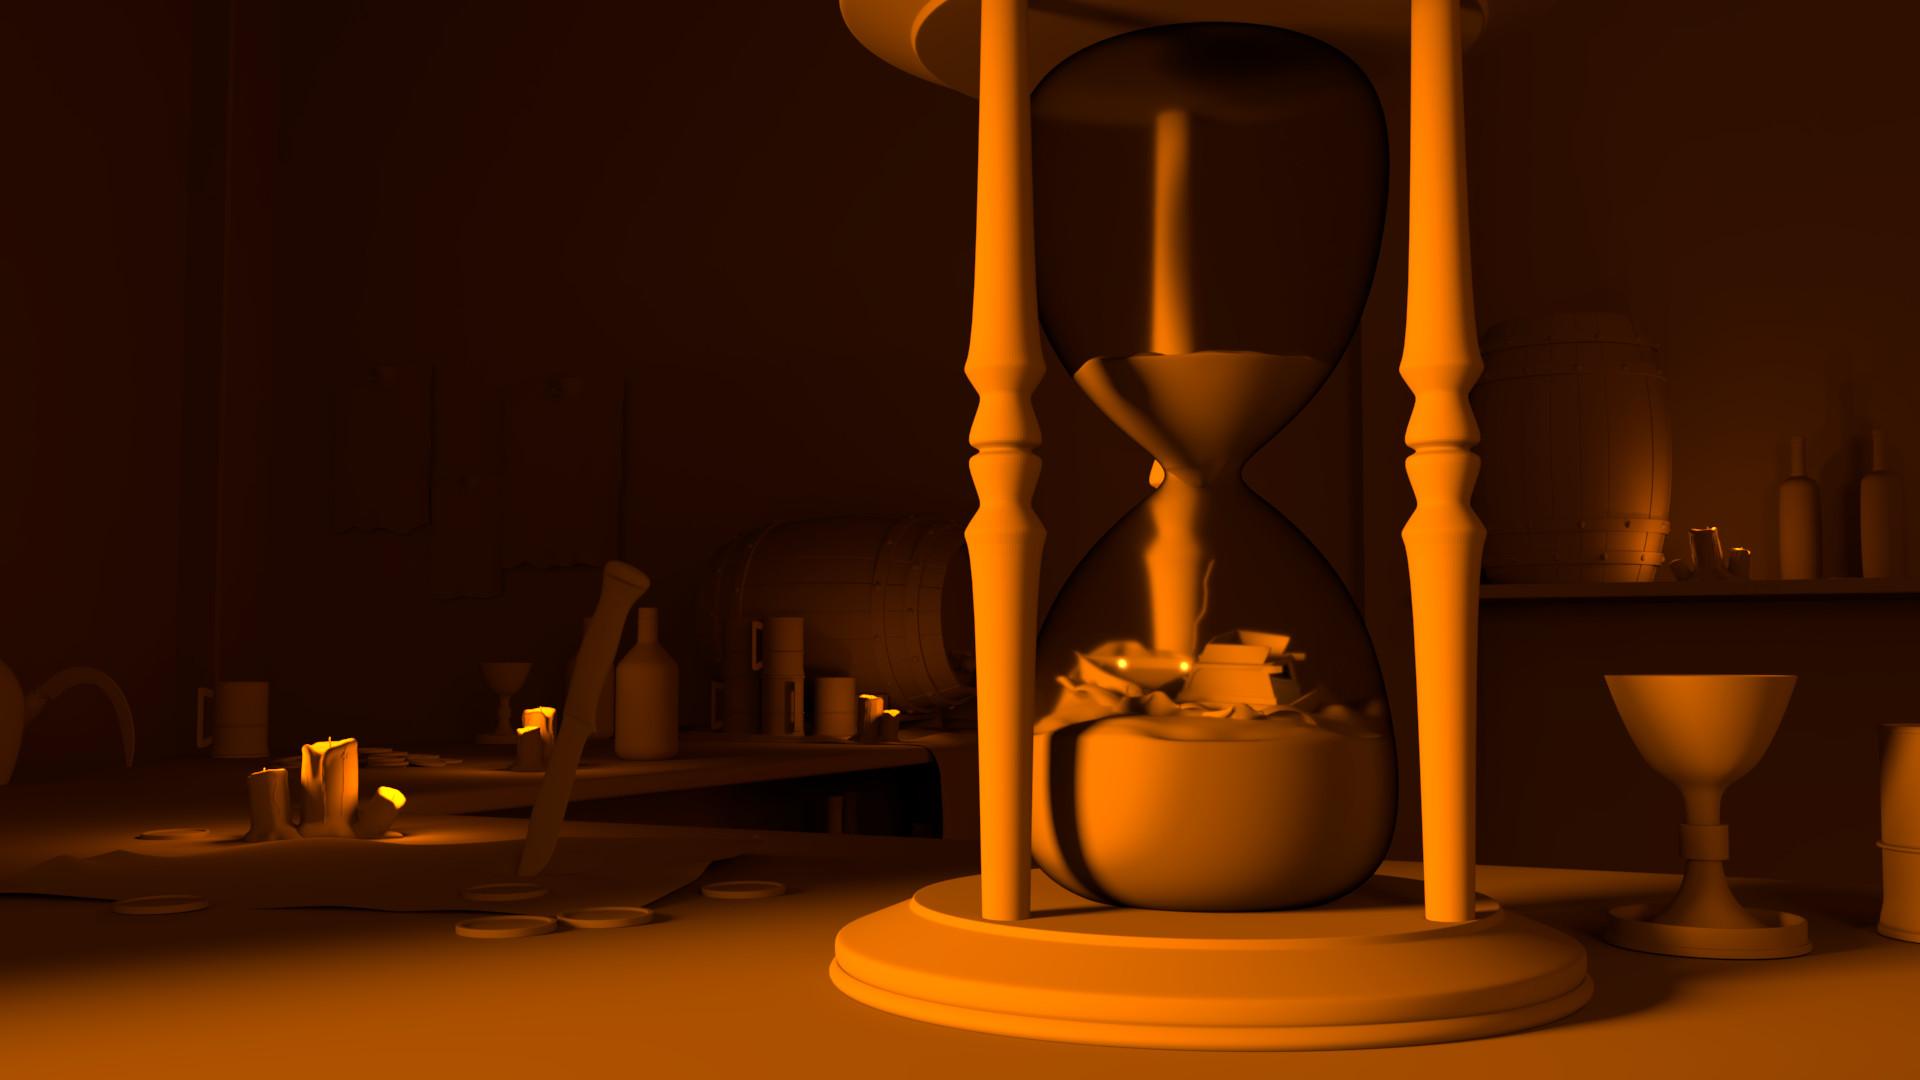 Pietro bernardi hourglass clayrender filtered